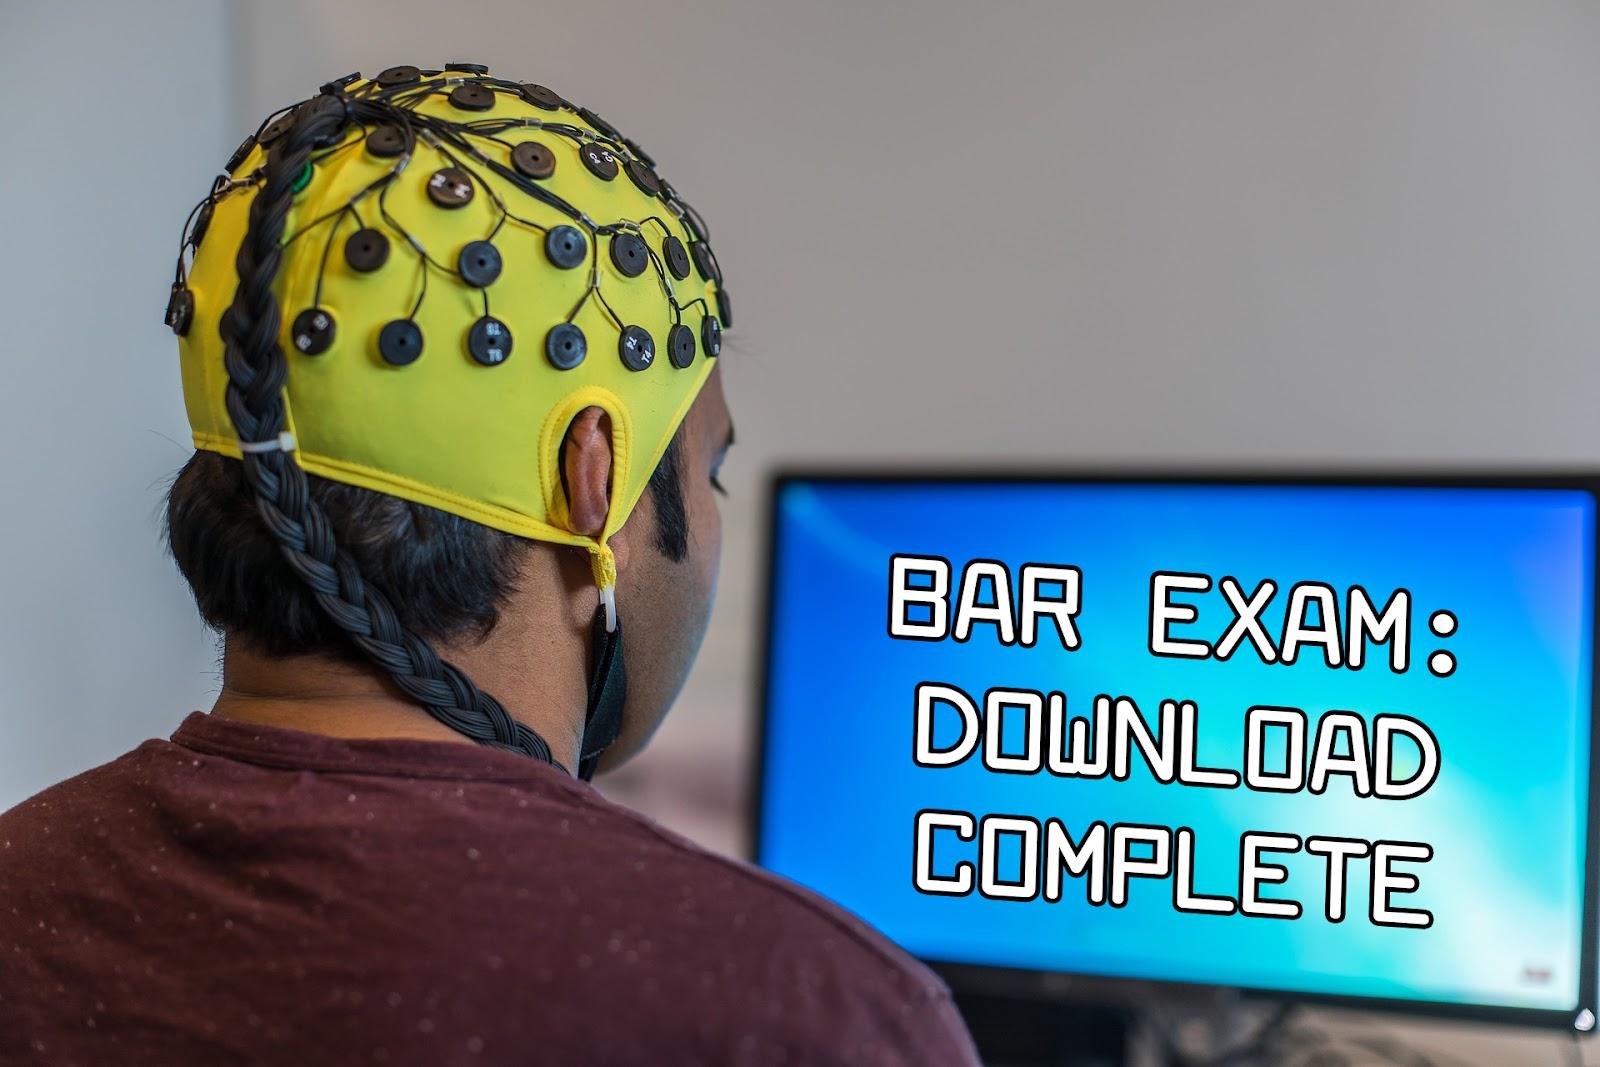 Man downloading bar exam material to his brain